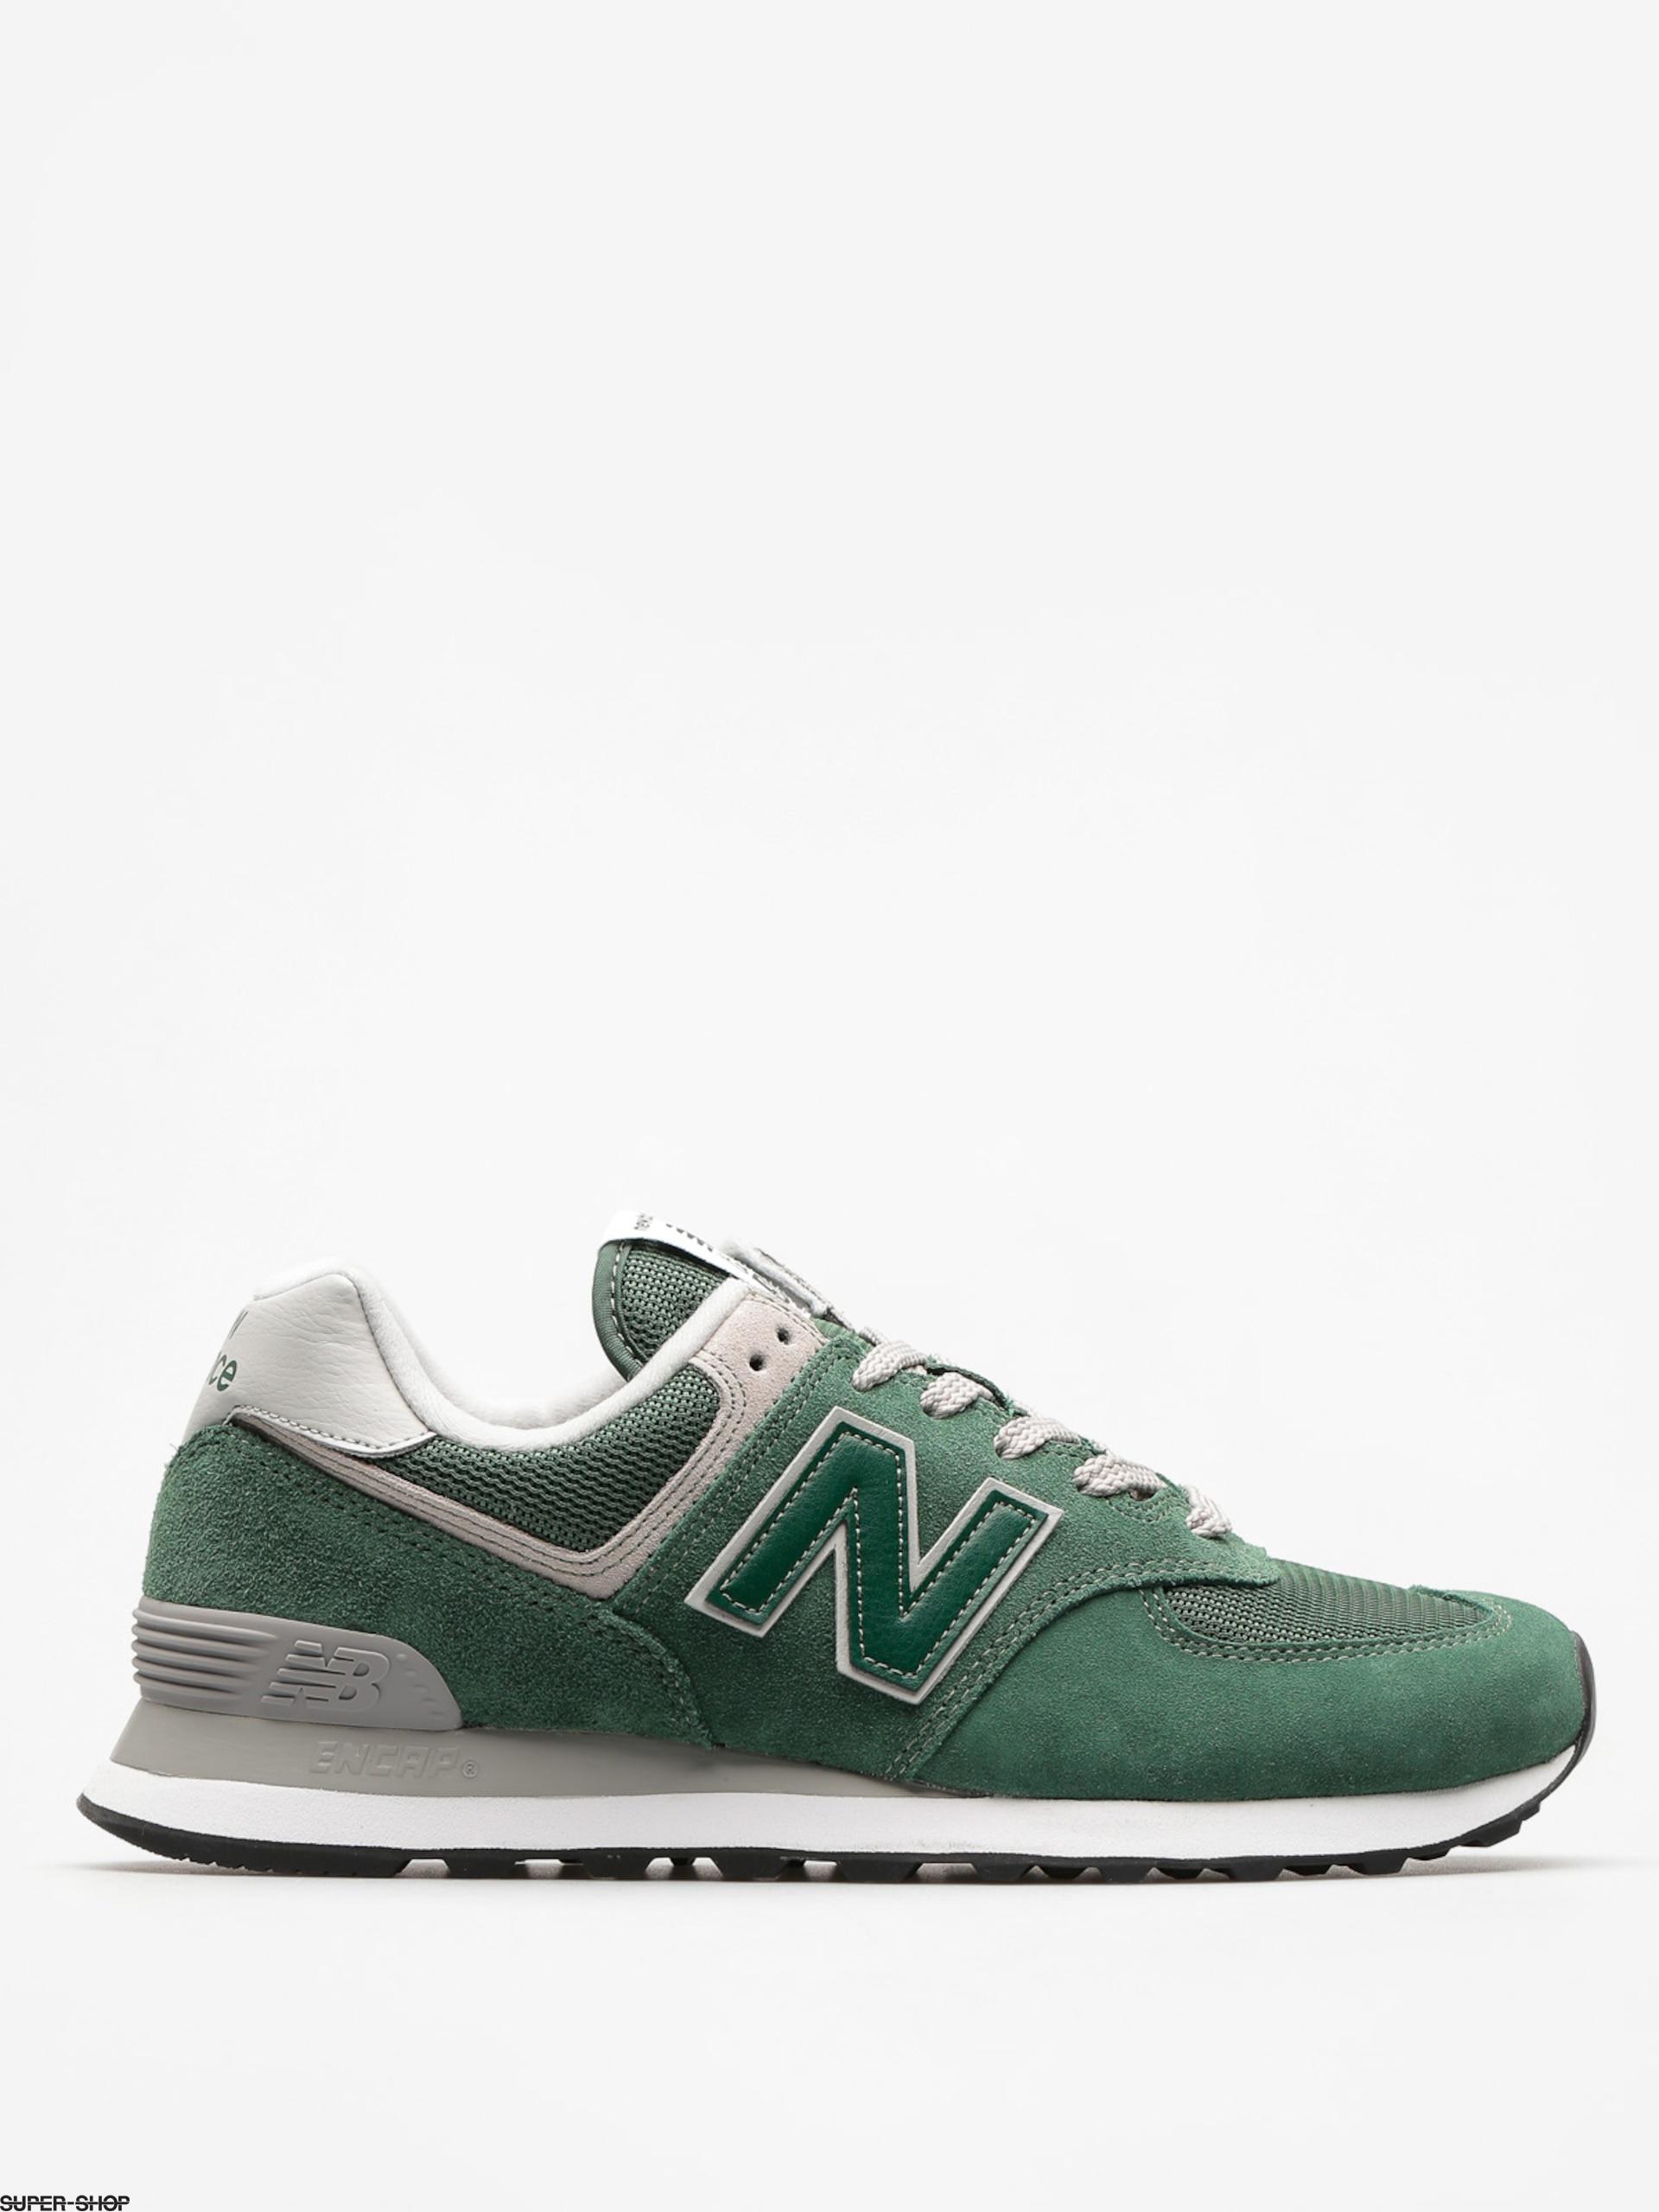 new balance 574 forest green